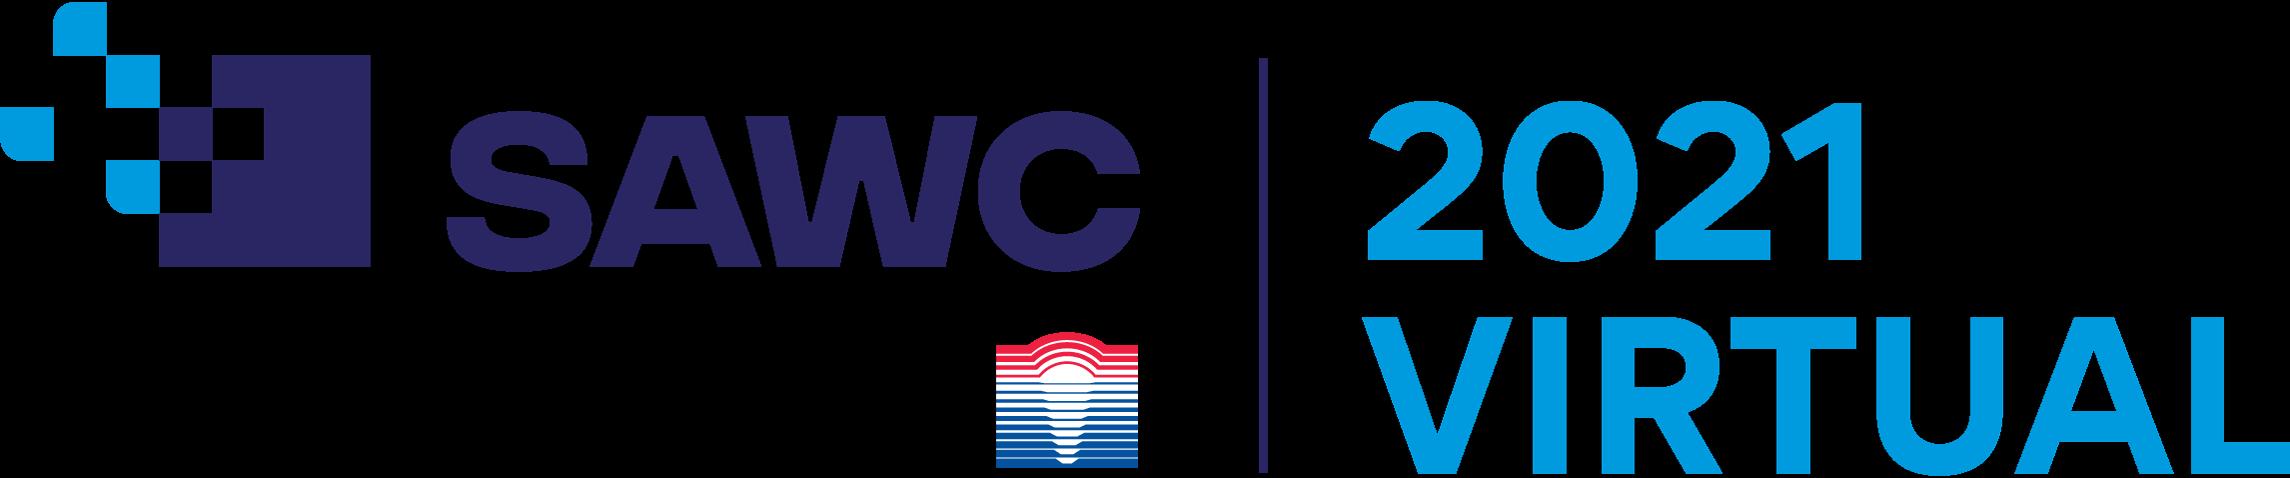 2021-SAWC-WHS-Logo-Virtual-Vert_4C